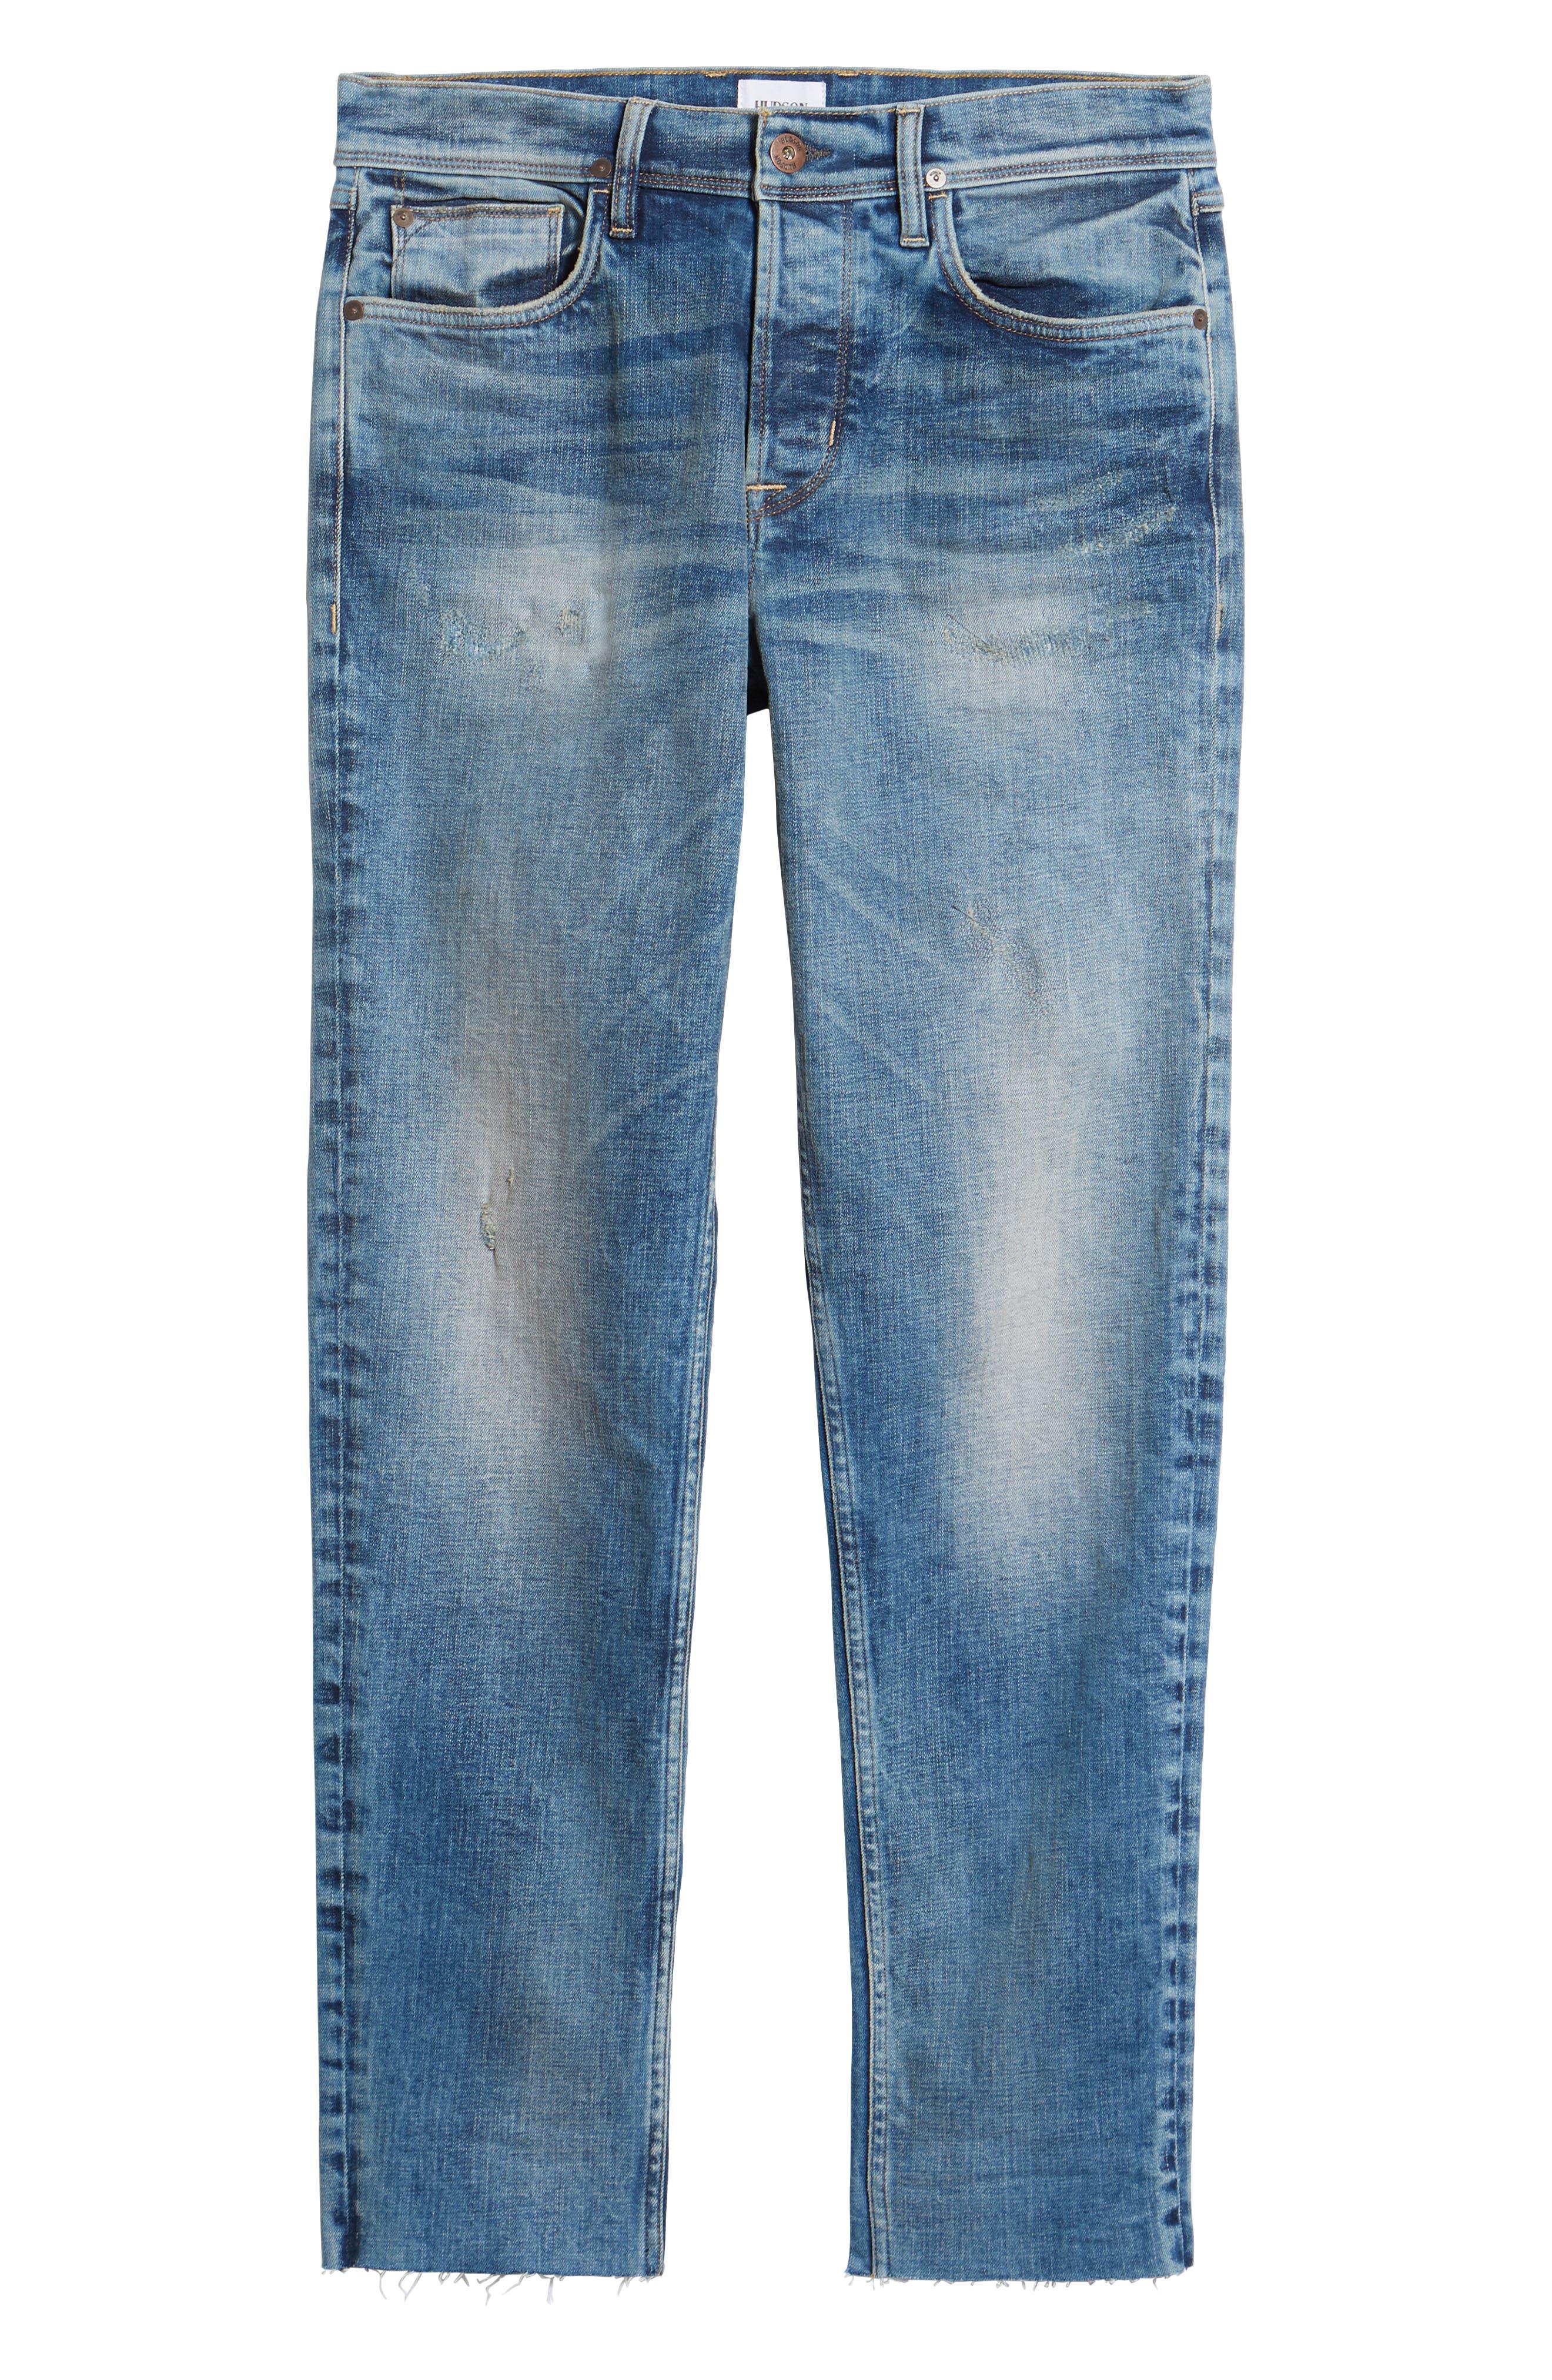 Sartor Slouchy Skinny Fit Jeans,                             Alternate thumbnail 6, color,                             Los Feliz